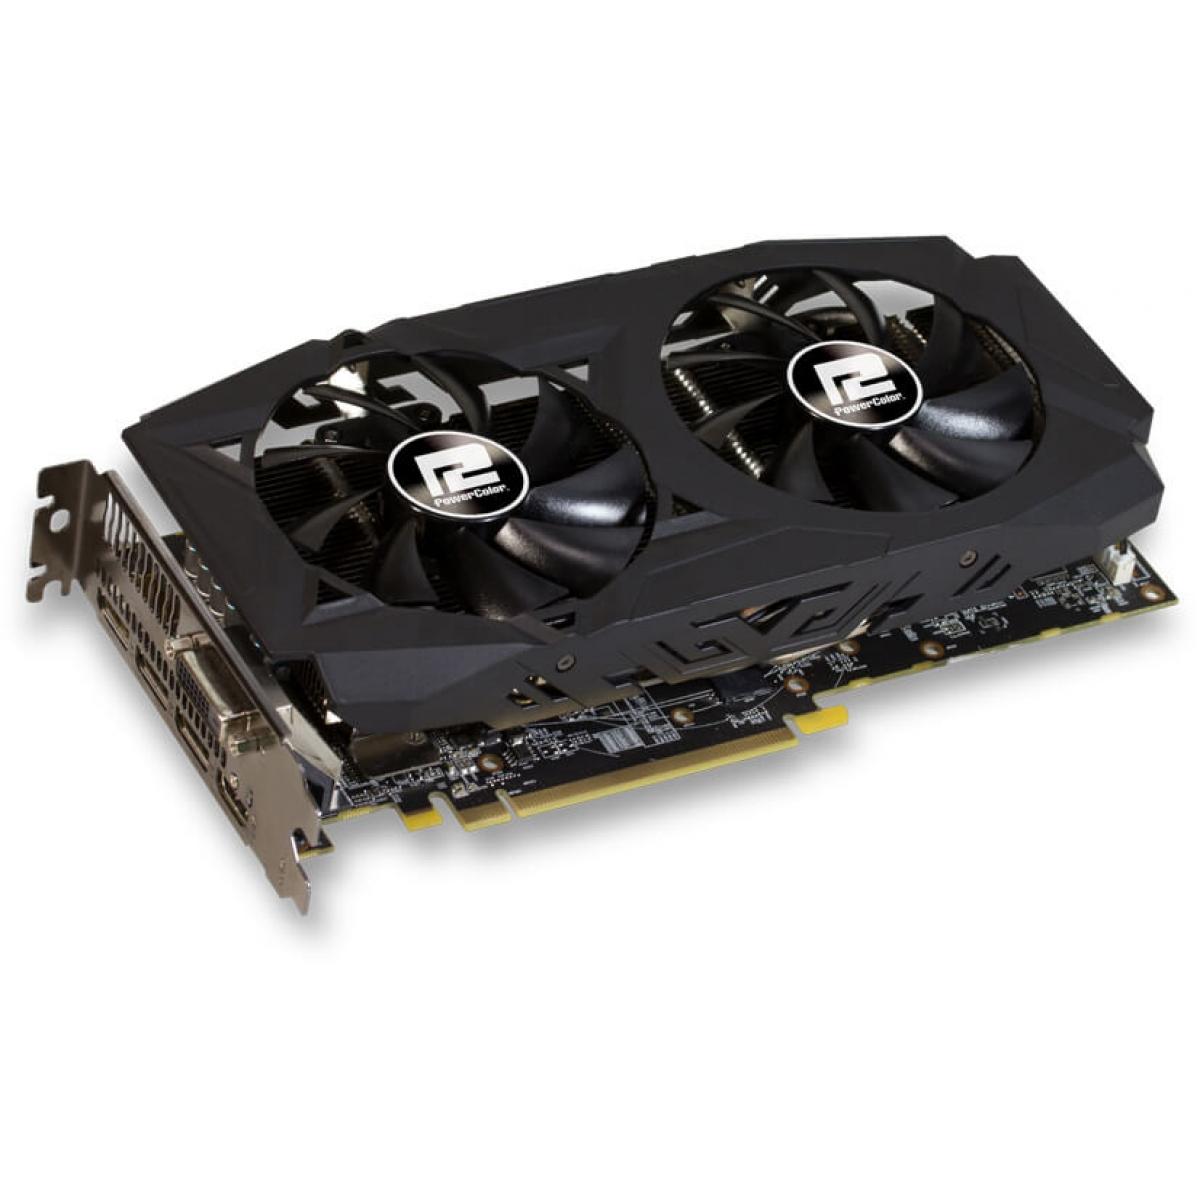 Placa de Vídeo PowerColor Radeon Red Dragon RX 580 8GB AXRX 580 8GBD5-3DHDV2/OC 256Bit GDDR5 PCI-EXP